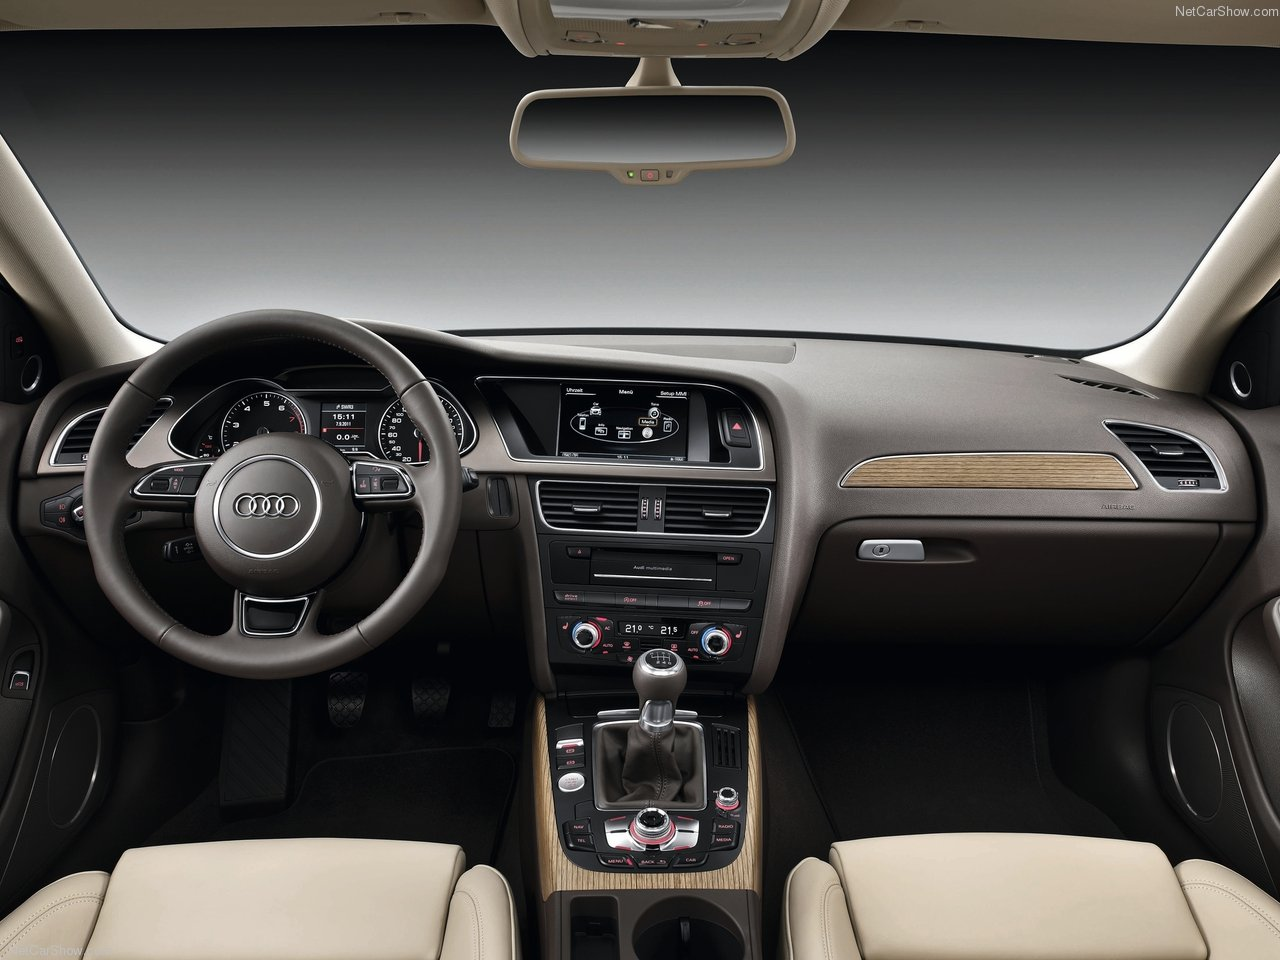 Tweedehands Audi A4 interieur